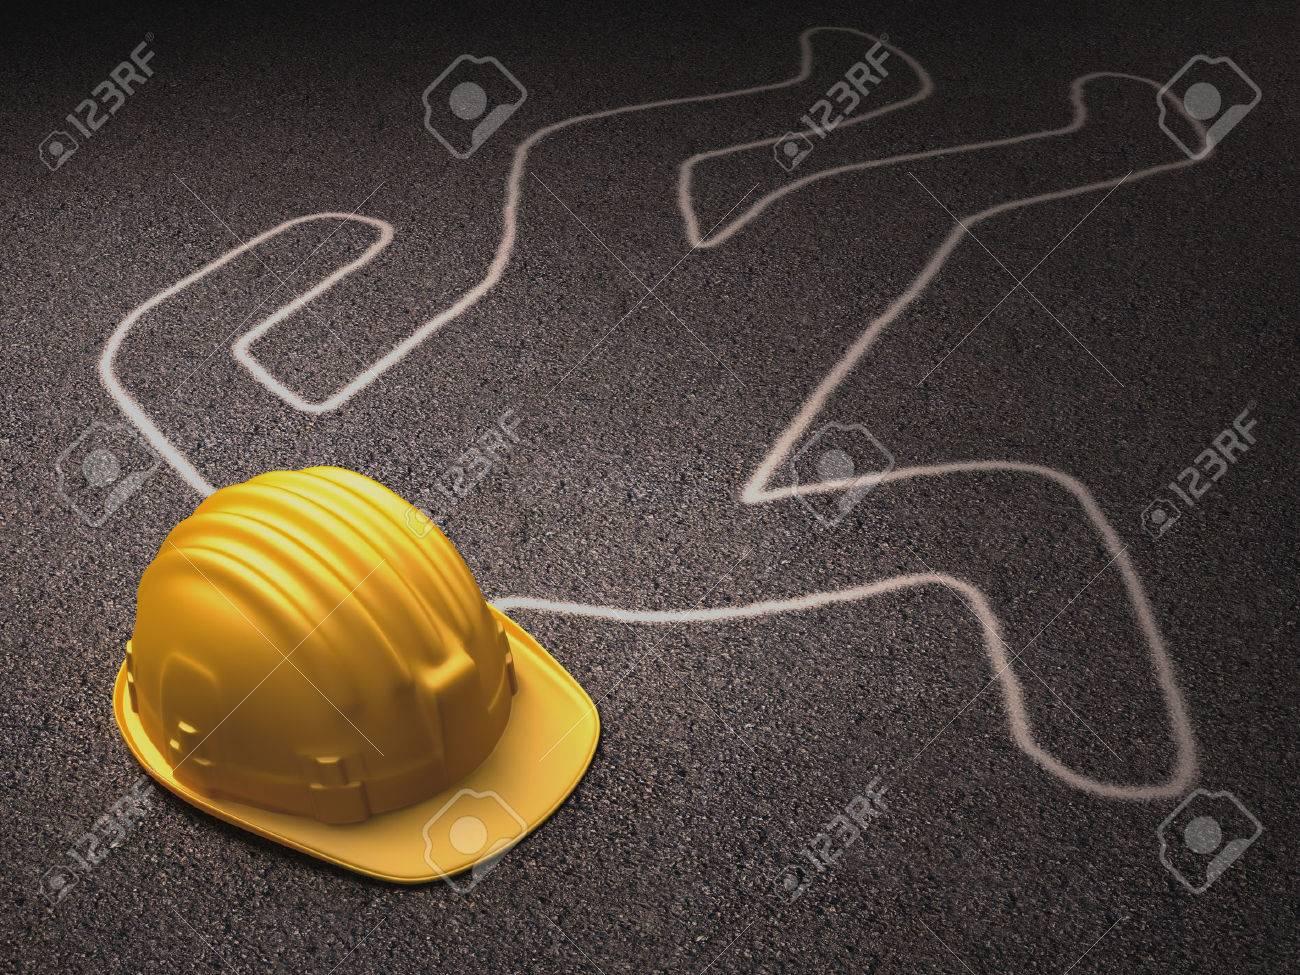 A Helmet Over The Dead Body Outline Stock Photo